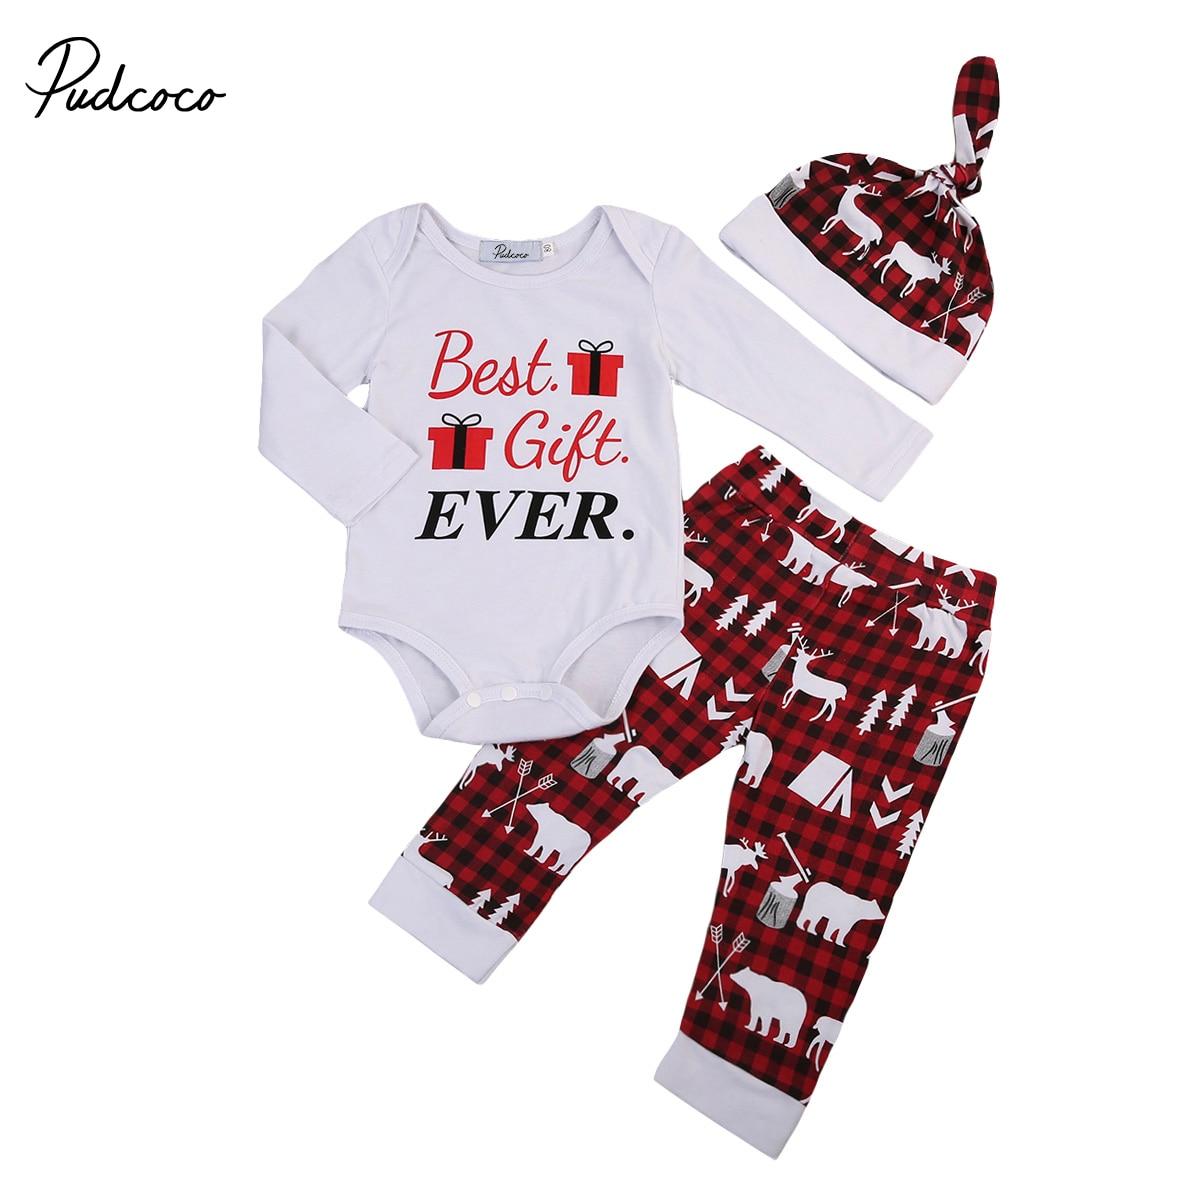 2017 Christmas Newborn Baby Boys Girls Winter Clothes Romper Jumpsuit Plaid Pants Legging Hat Outfits Best Gift Ever 0-24M disney baby baby girls newborn 2 piece legging set